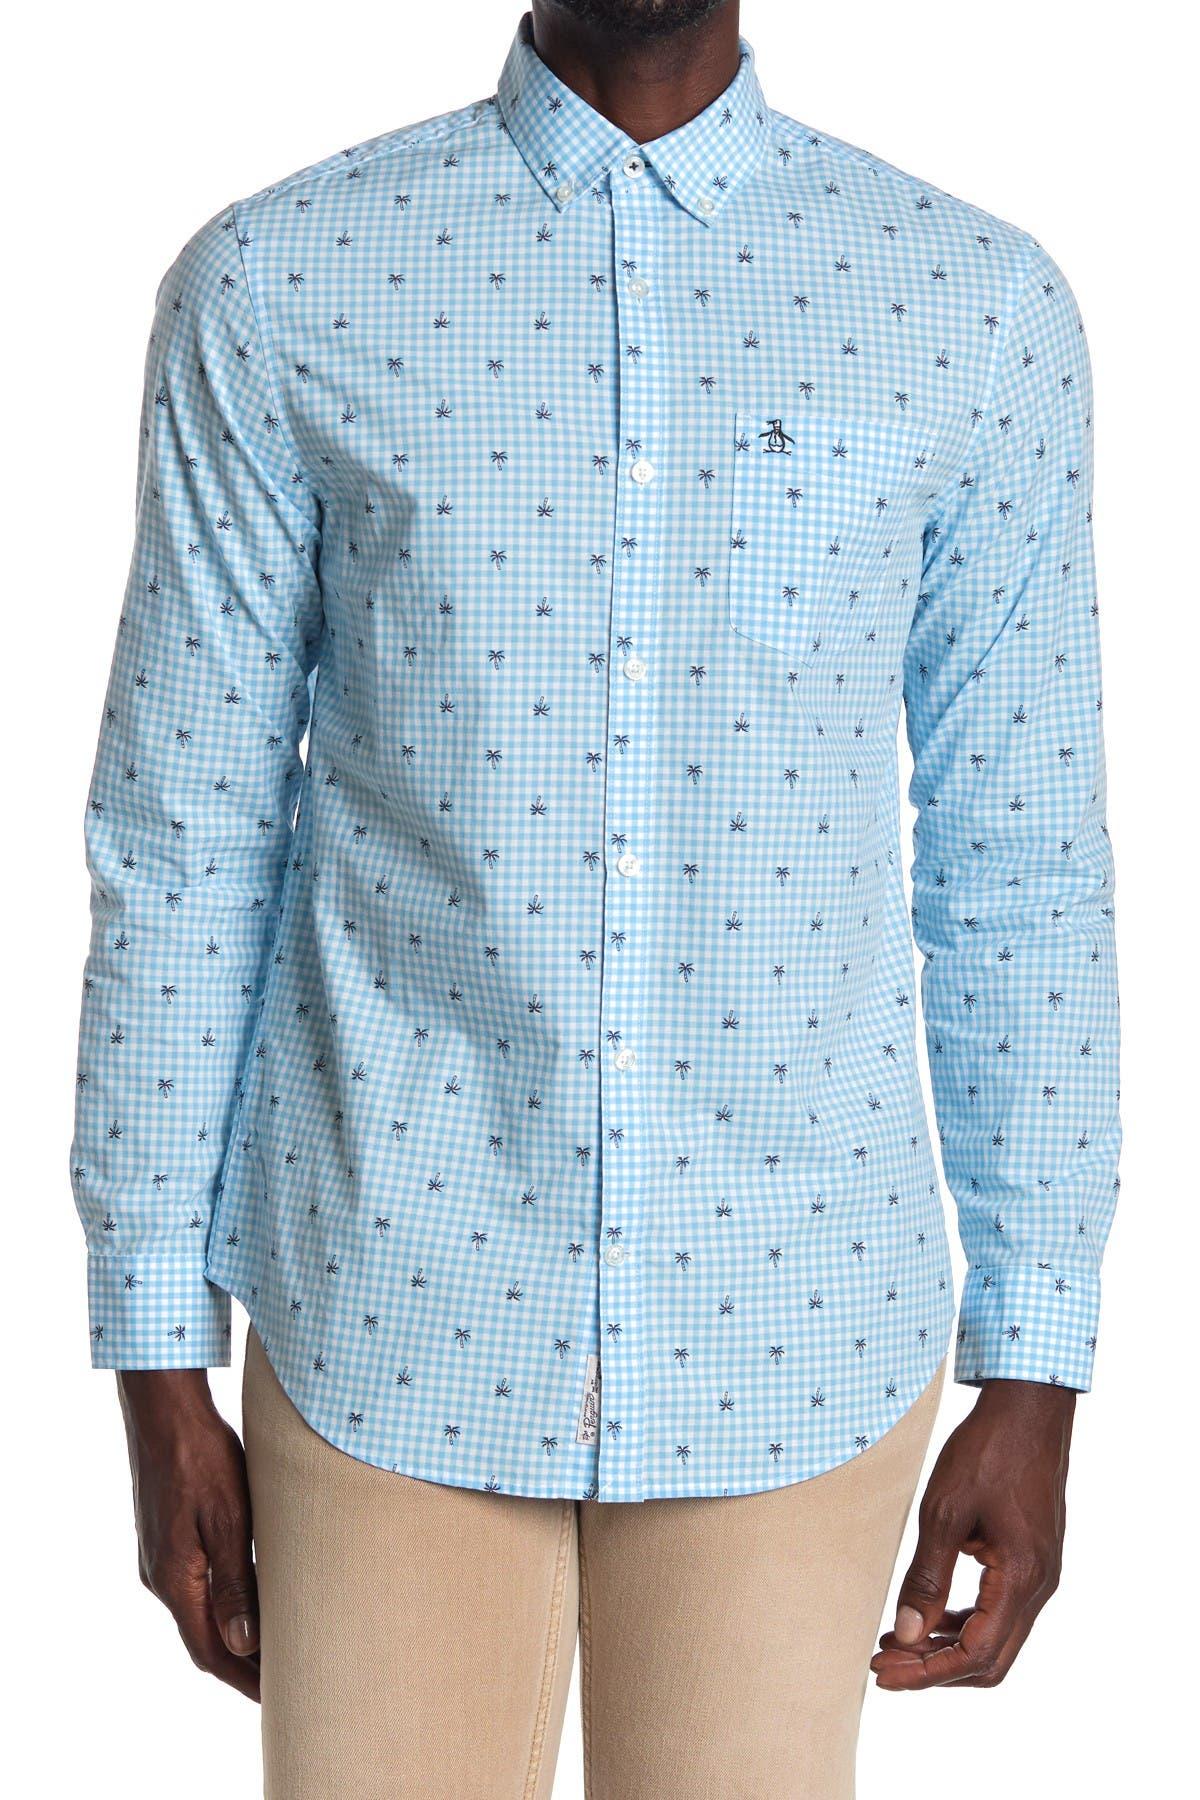 Original Penguin Boys Button Down Shirt Long Sleeve Collared Shirt